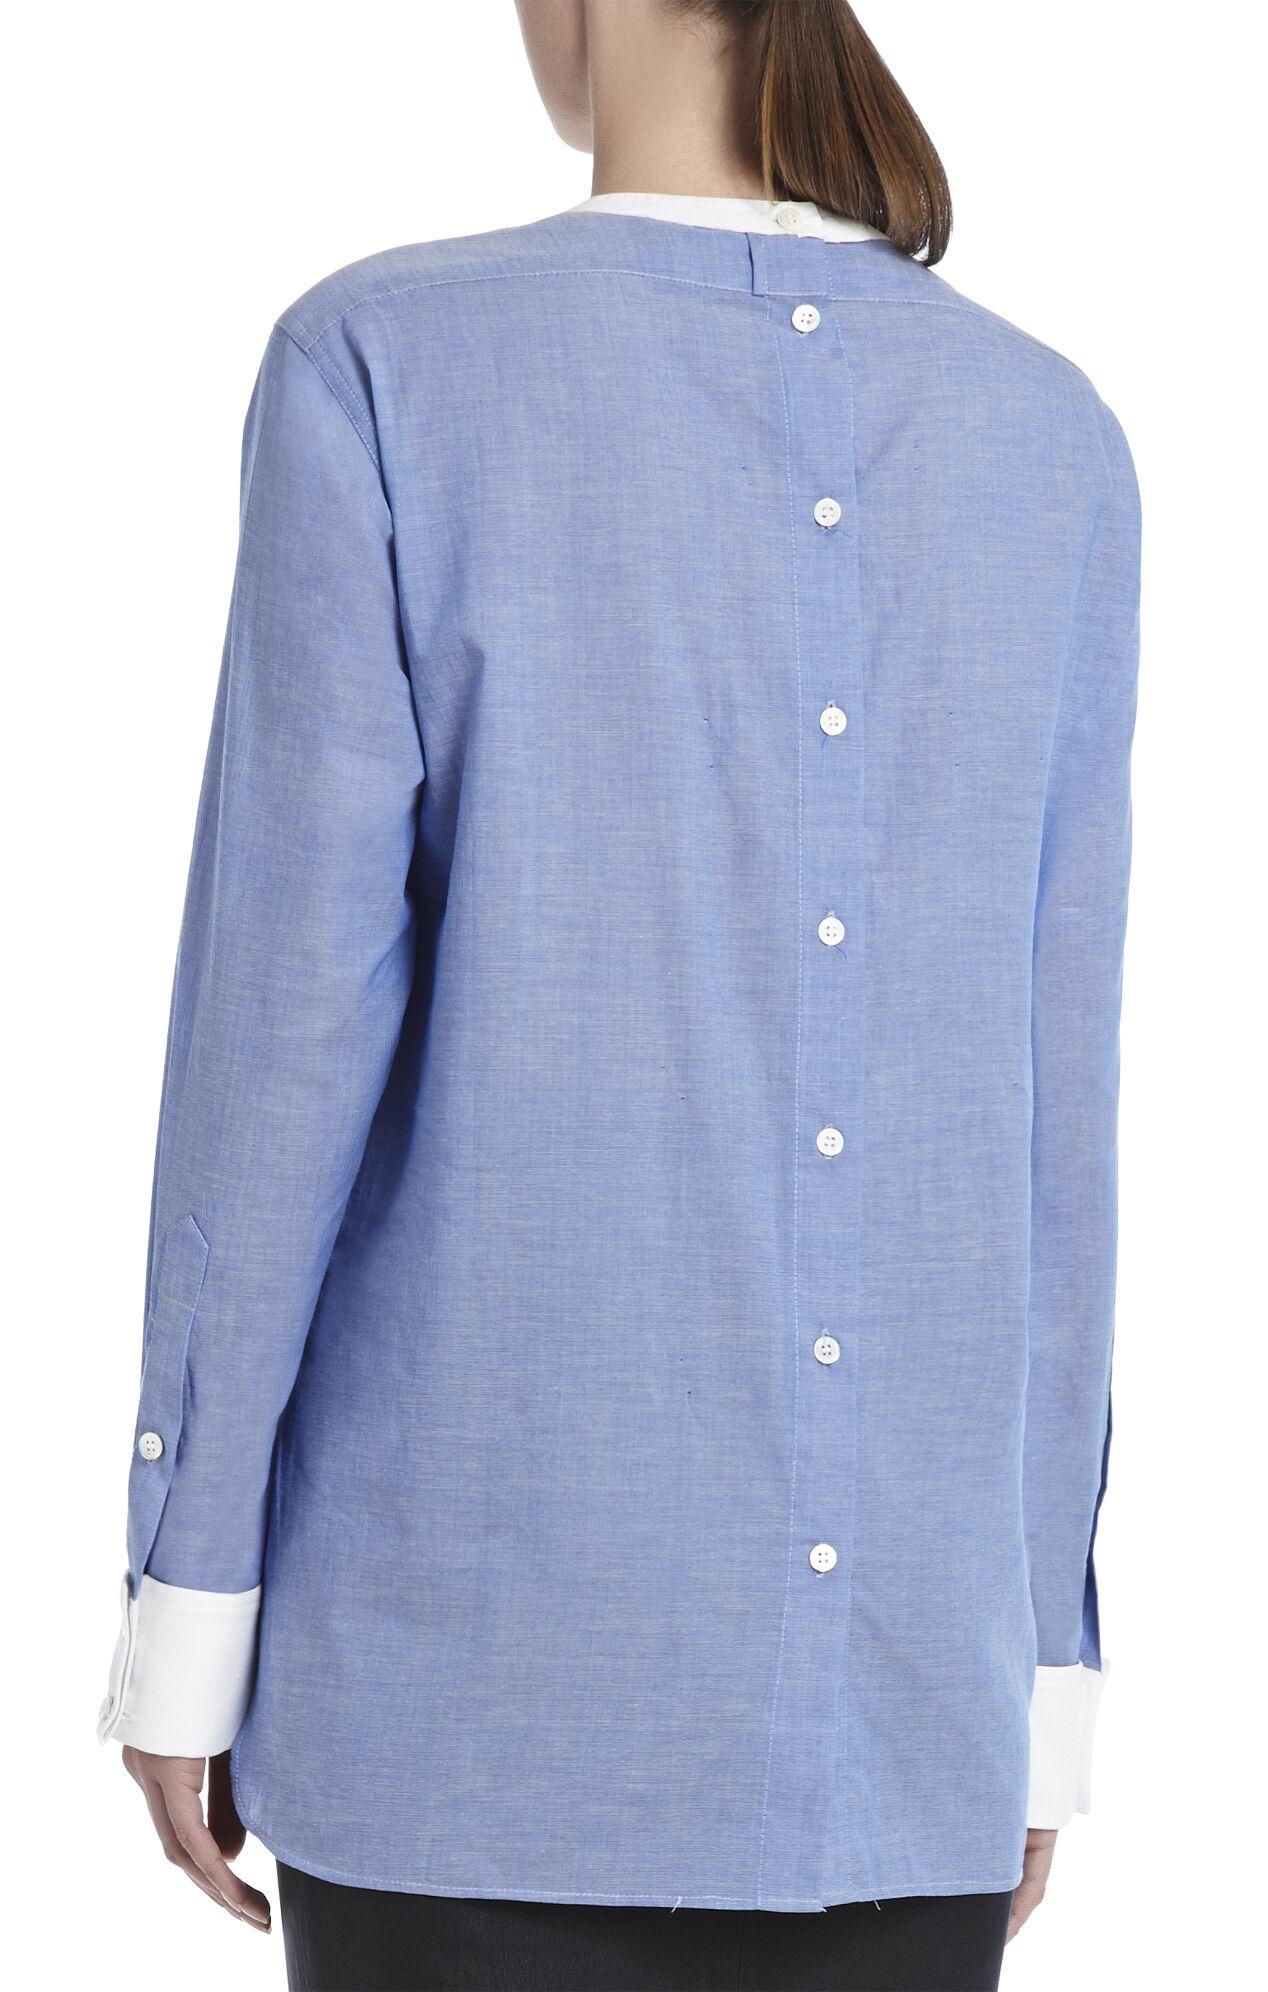 Kelin Tuxedo Shirt